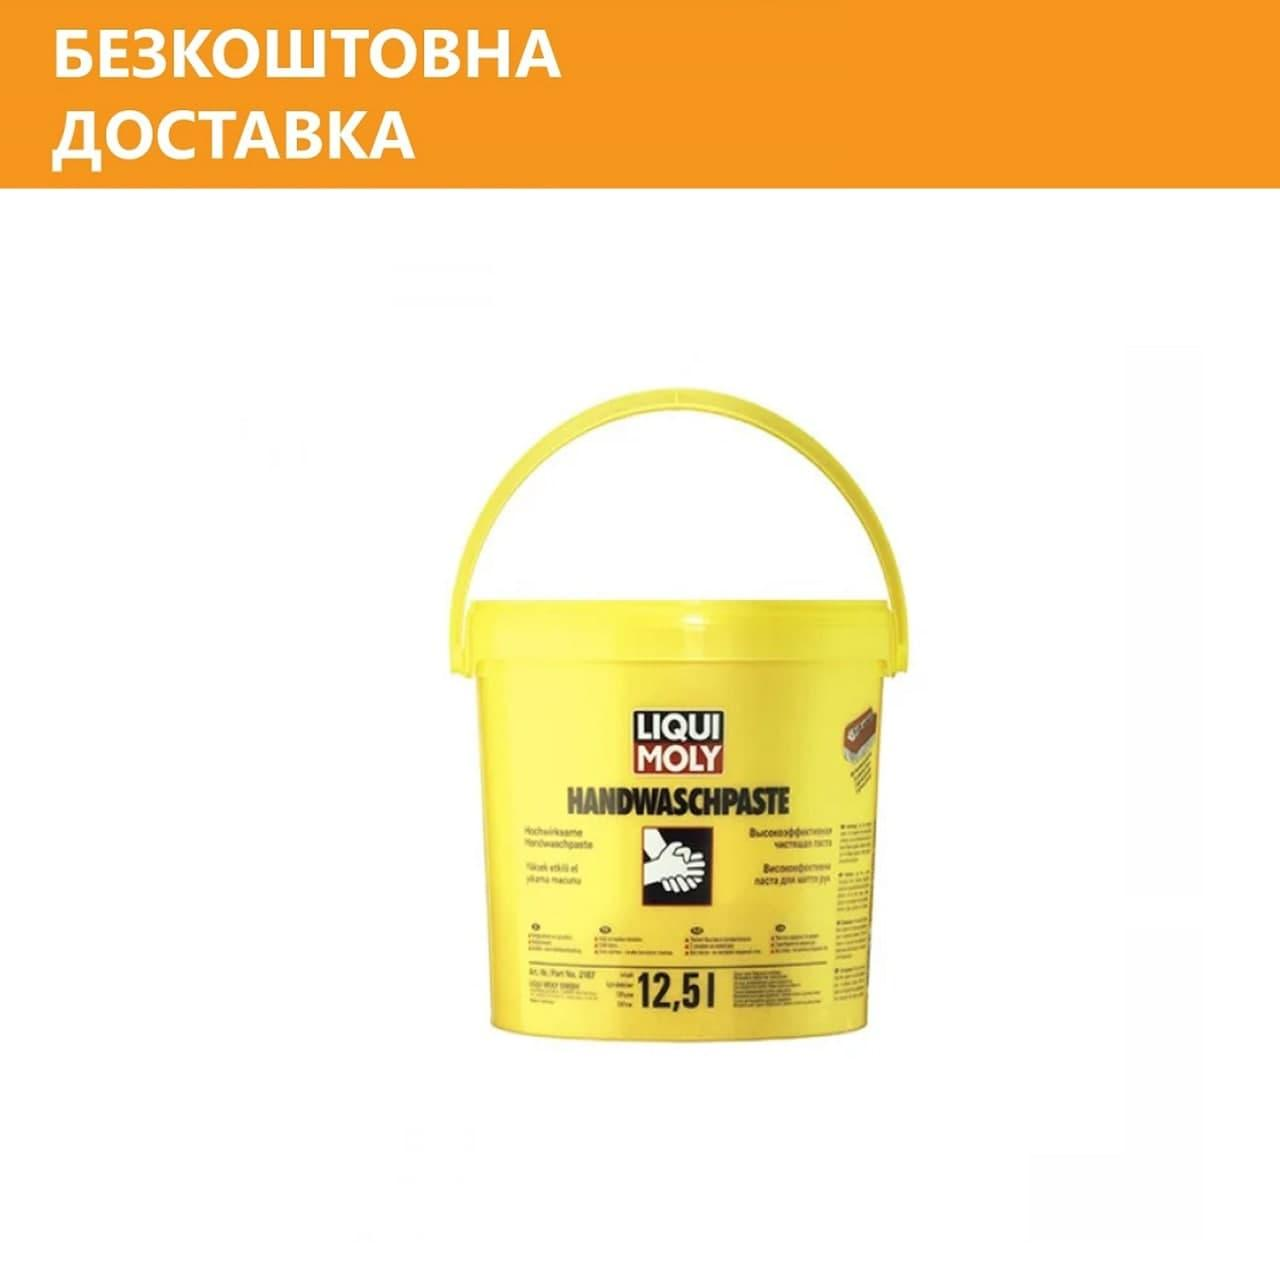 Паста для очистки рук - HANDWASCHPASTE   12.5 л.